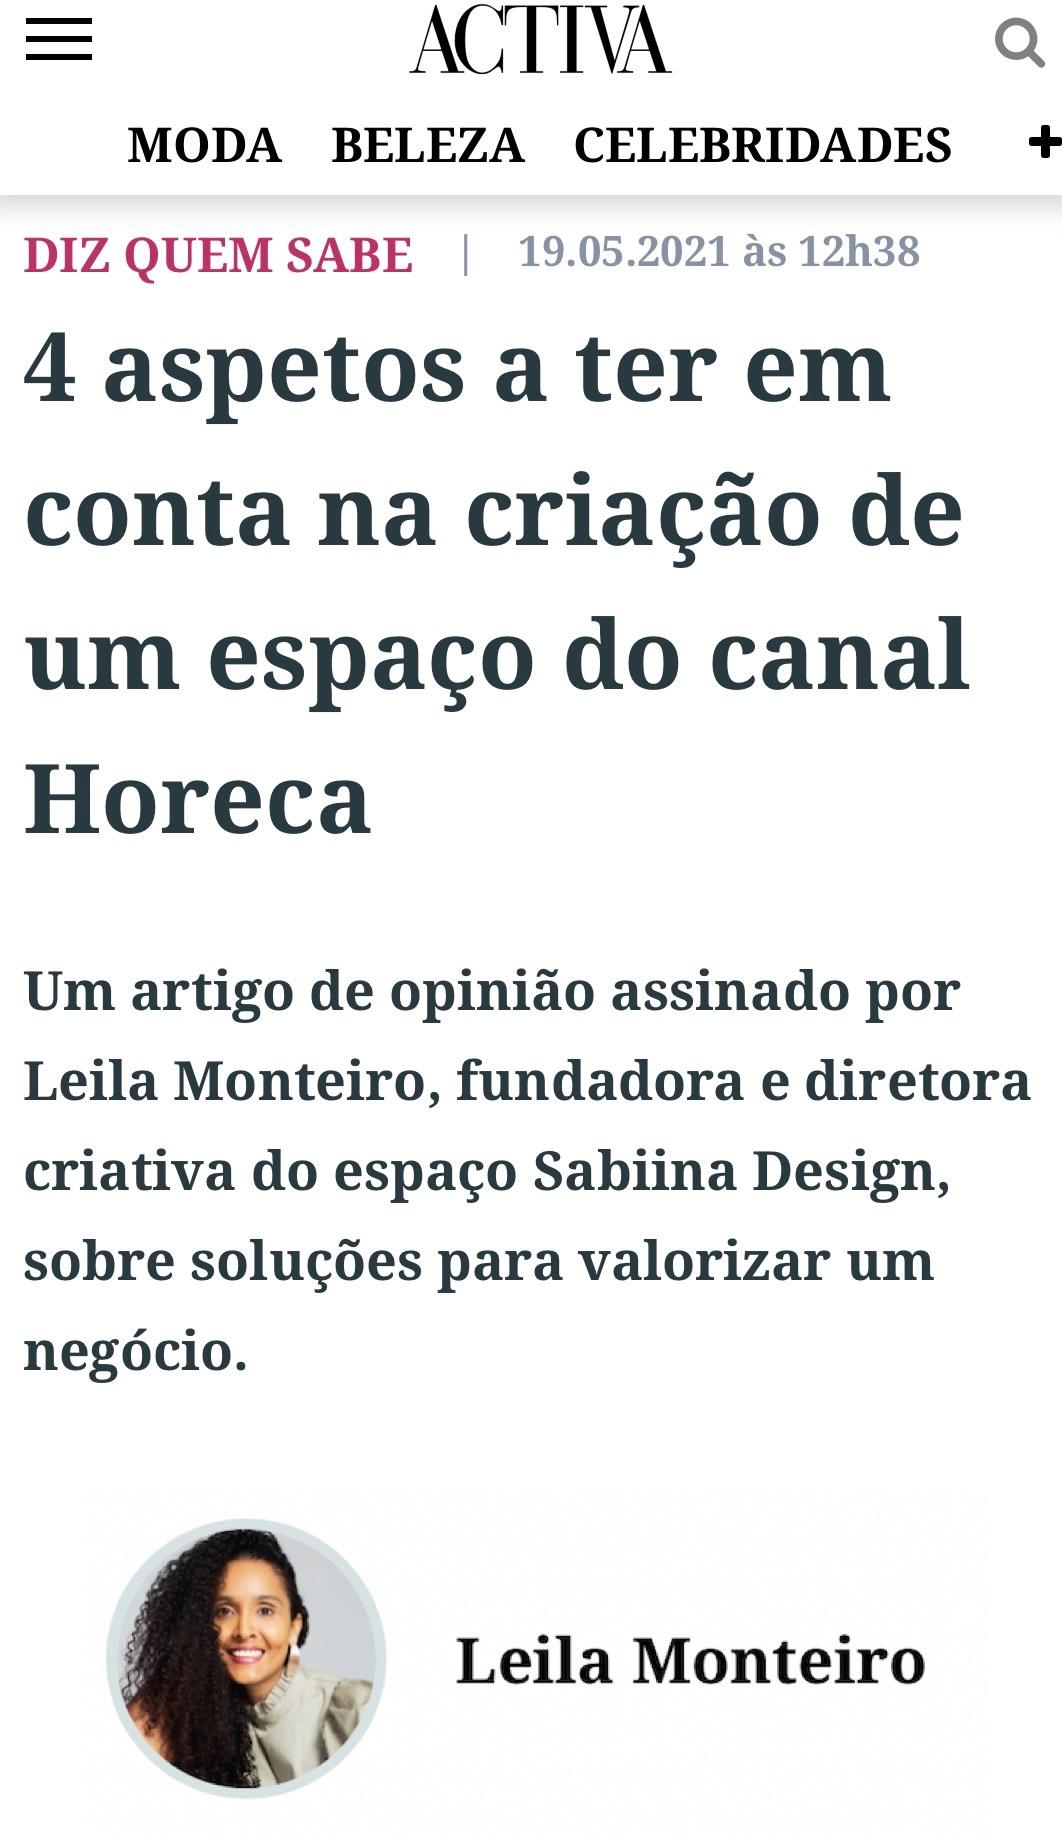 Design de Interiores | Atelier Sabiina Design | Artigo Press| Activa 05-2021